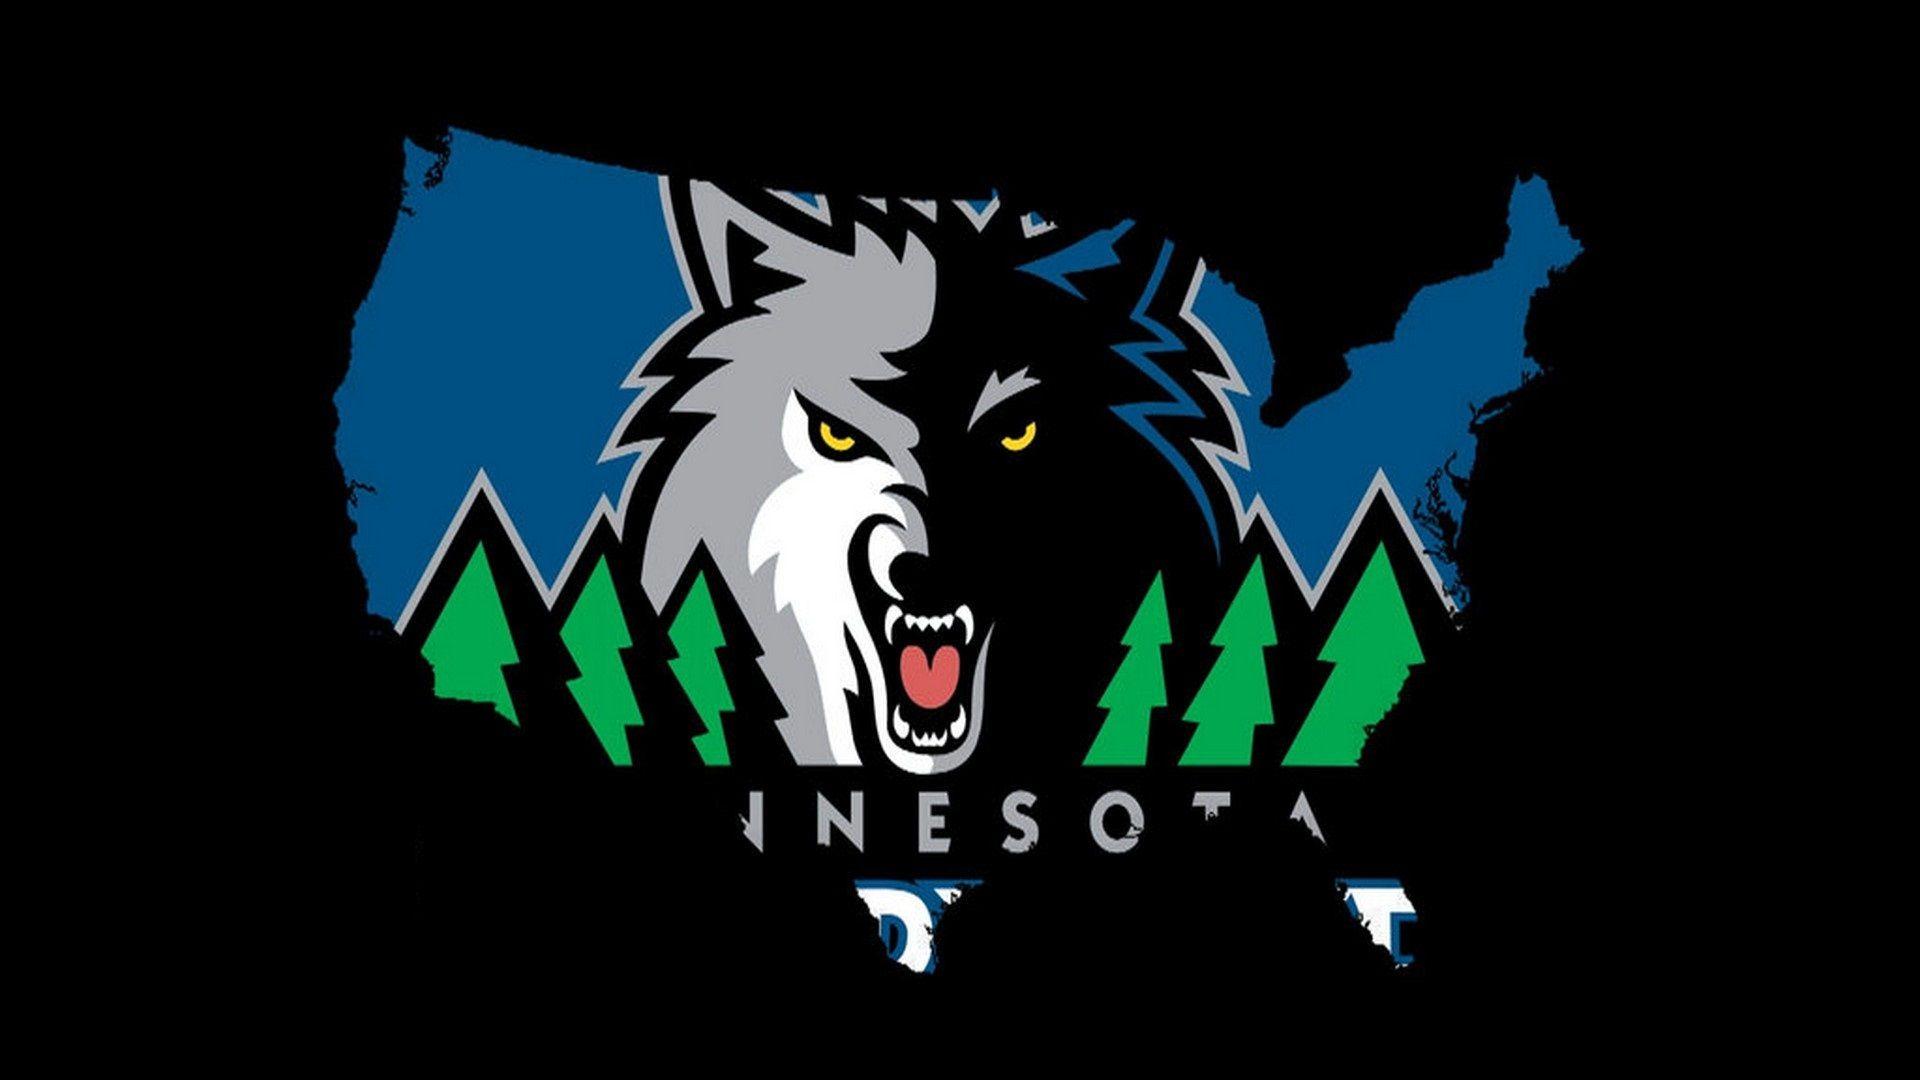 Minnesota Timberwolves wallpaper for pc